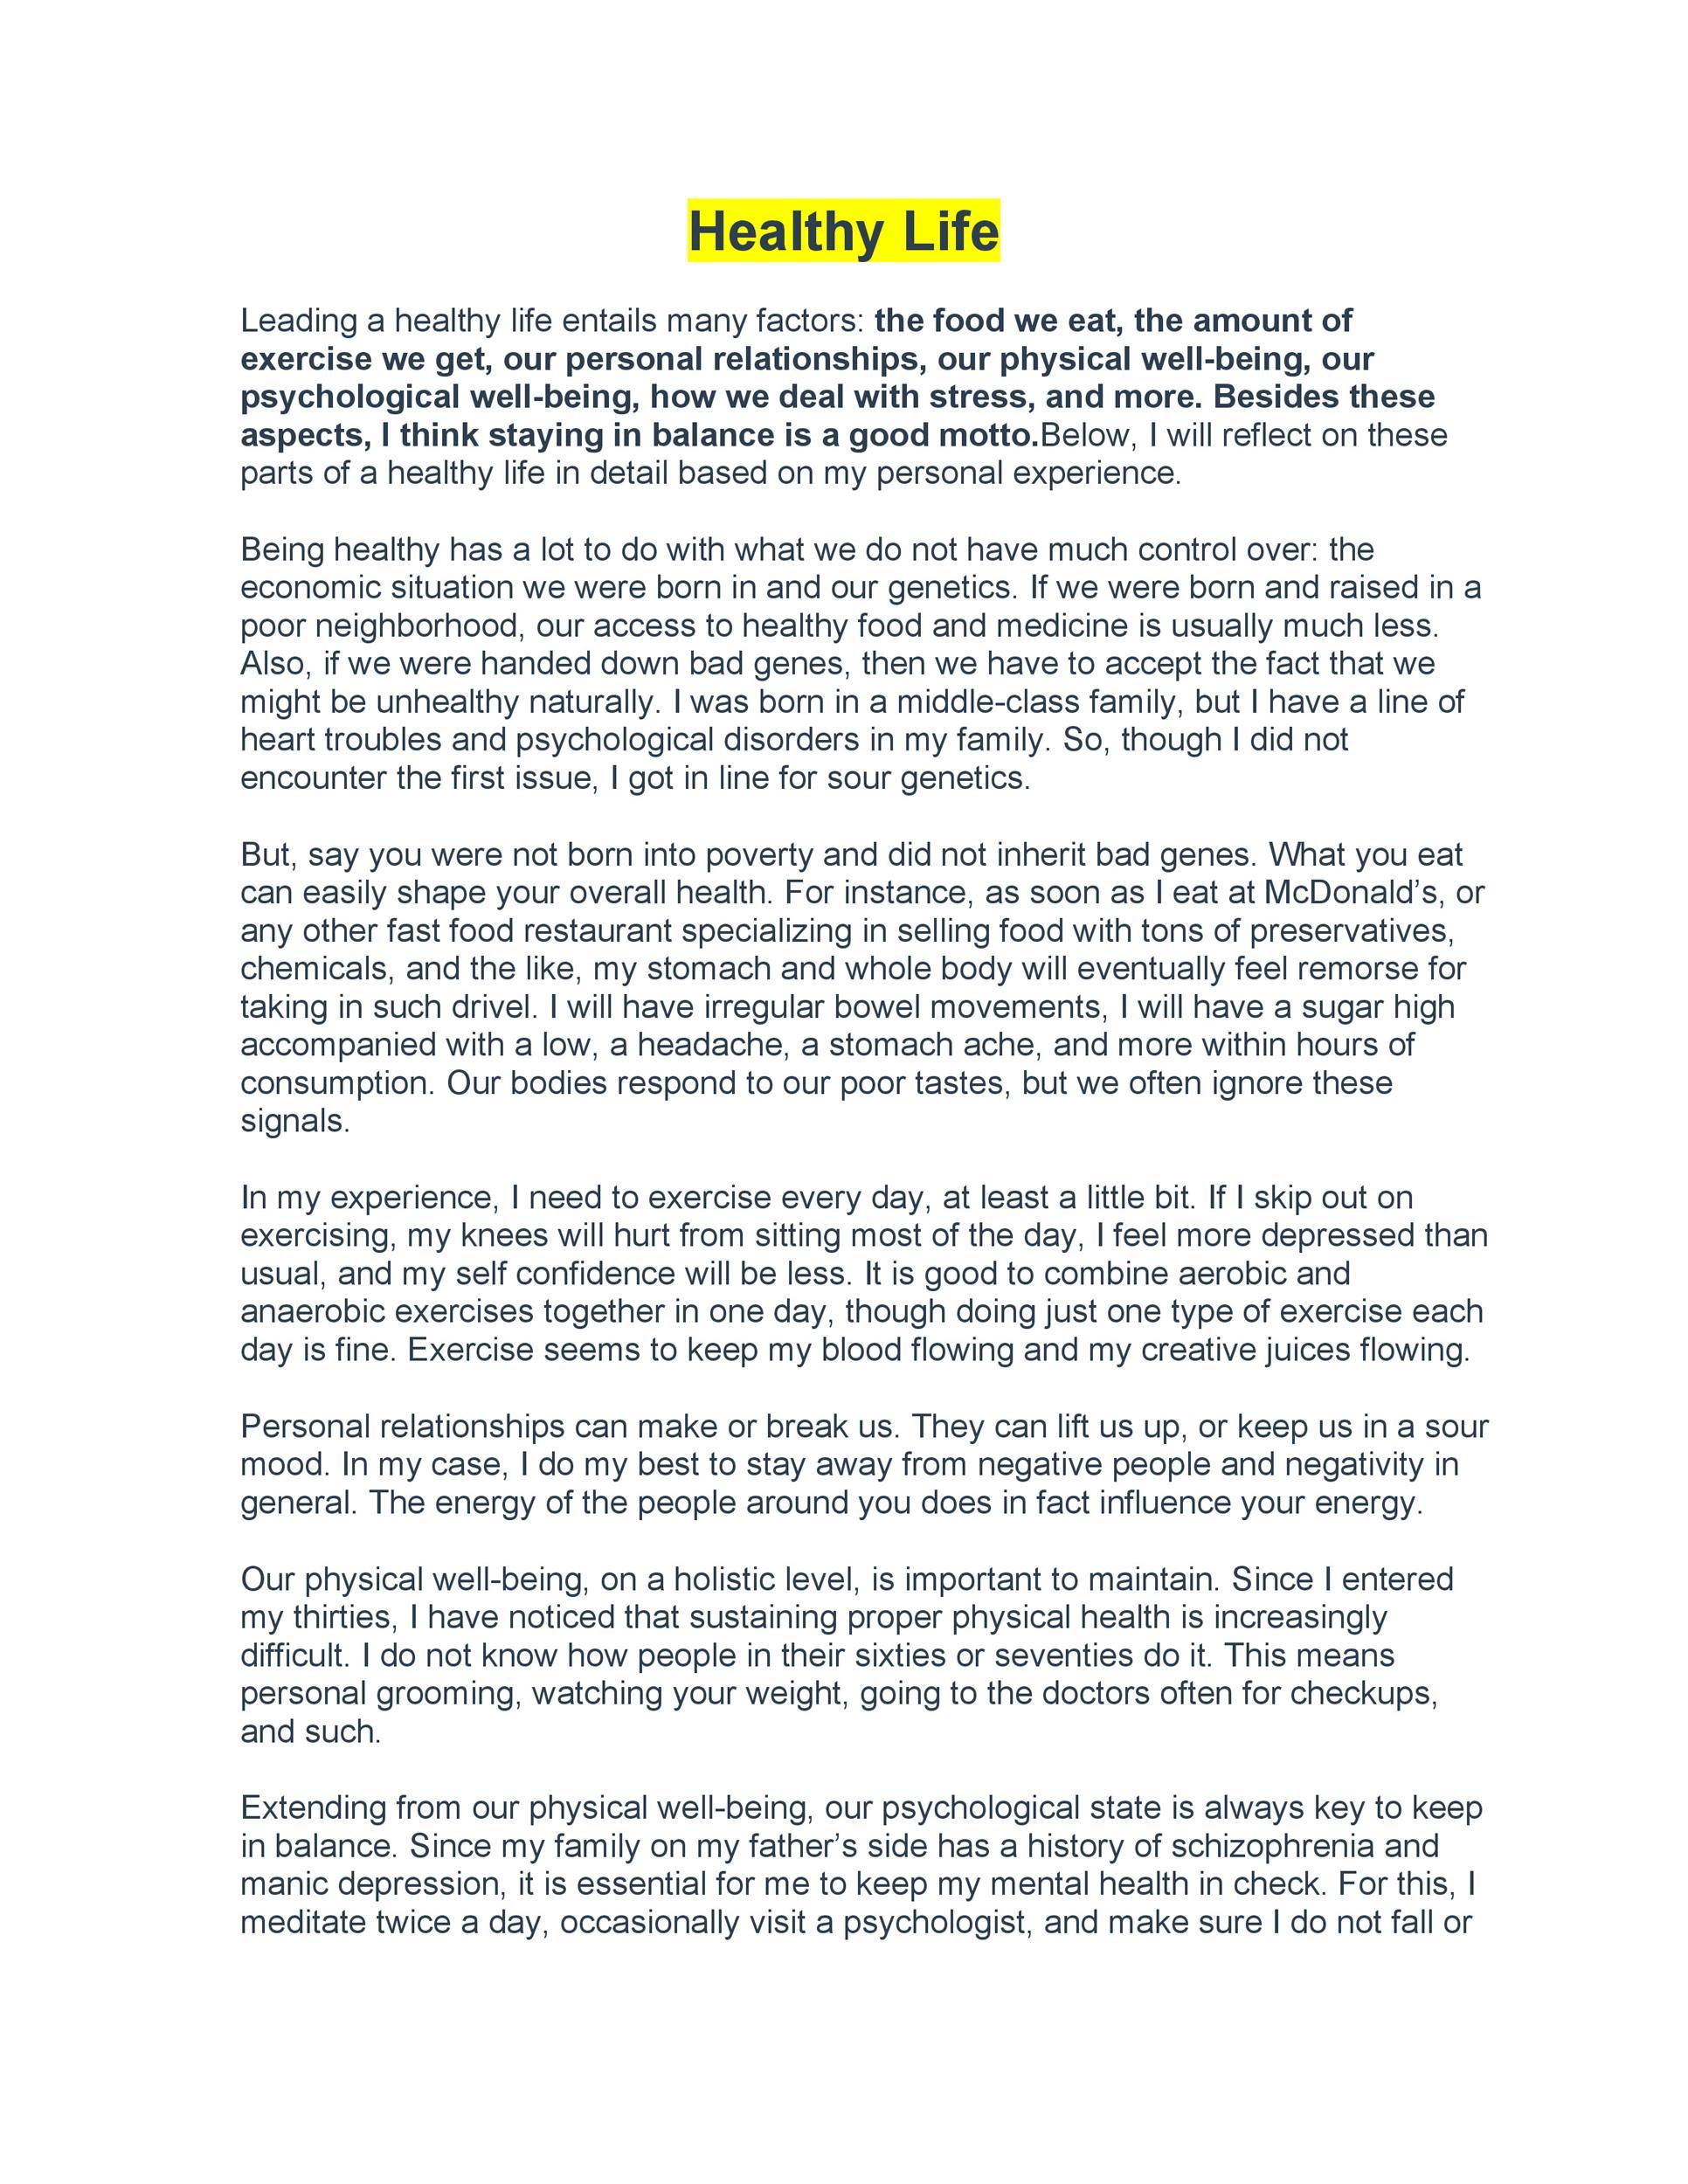 Free reflective essay example 47